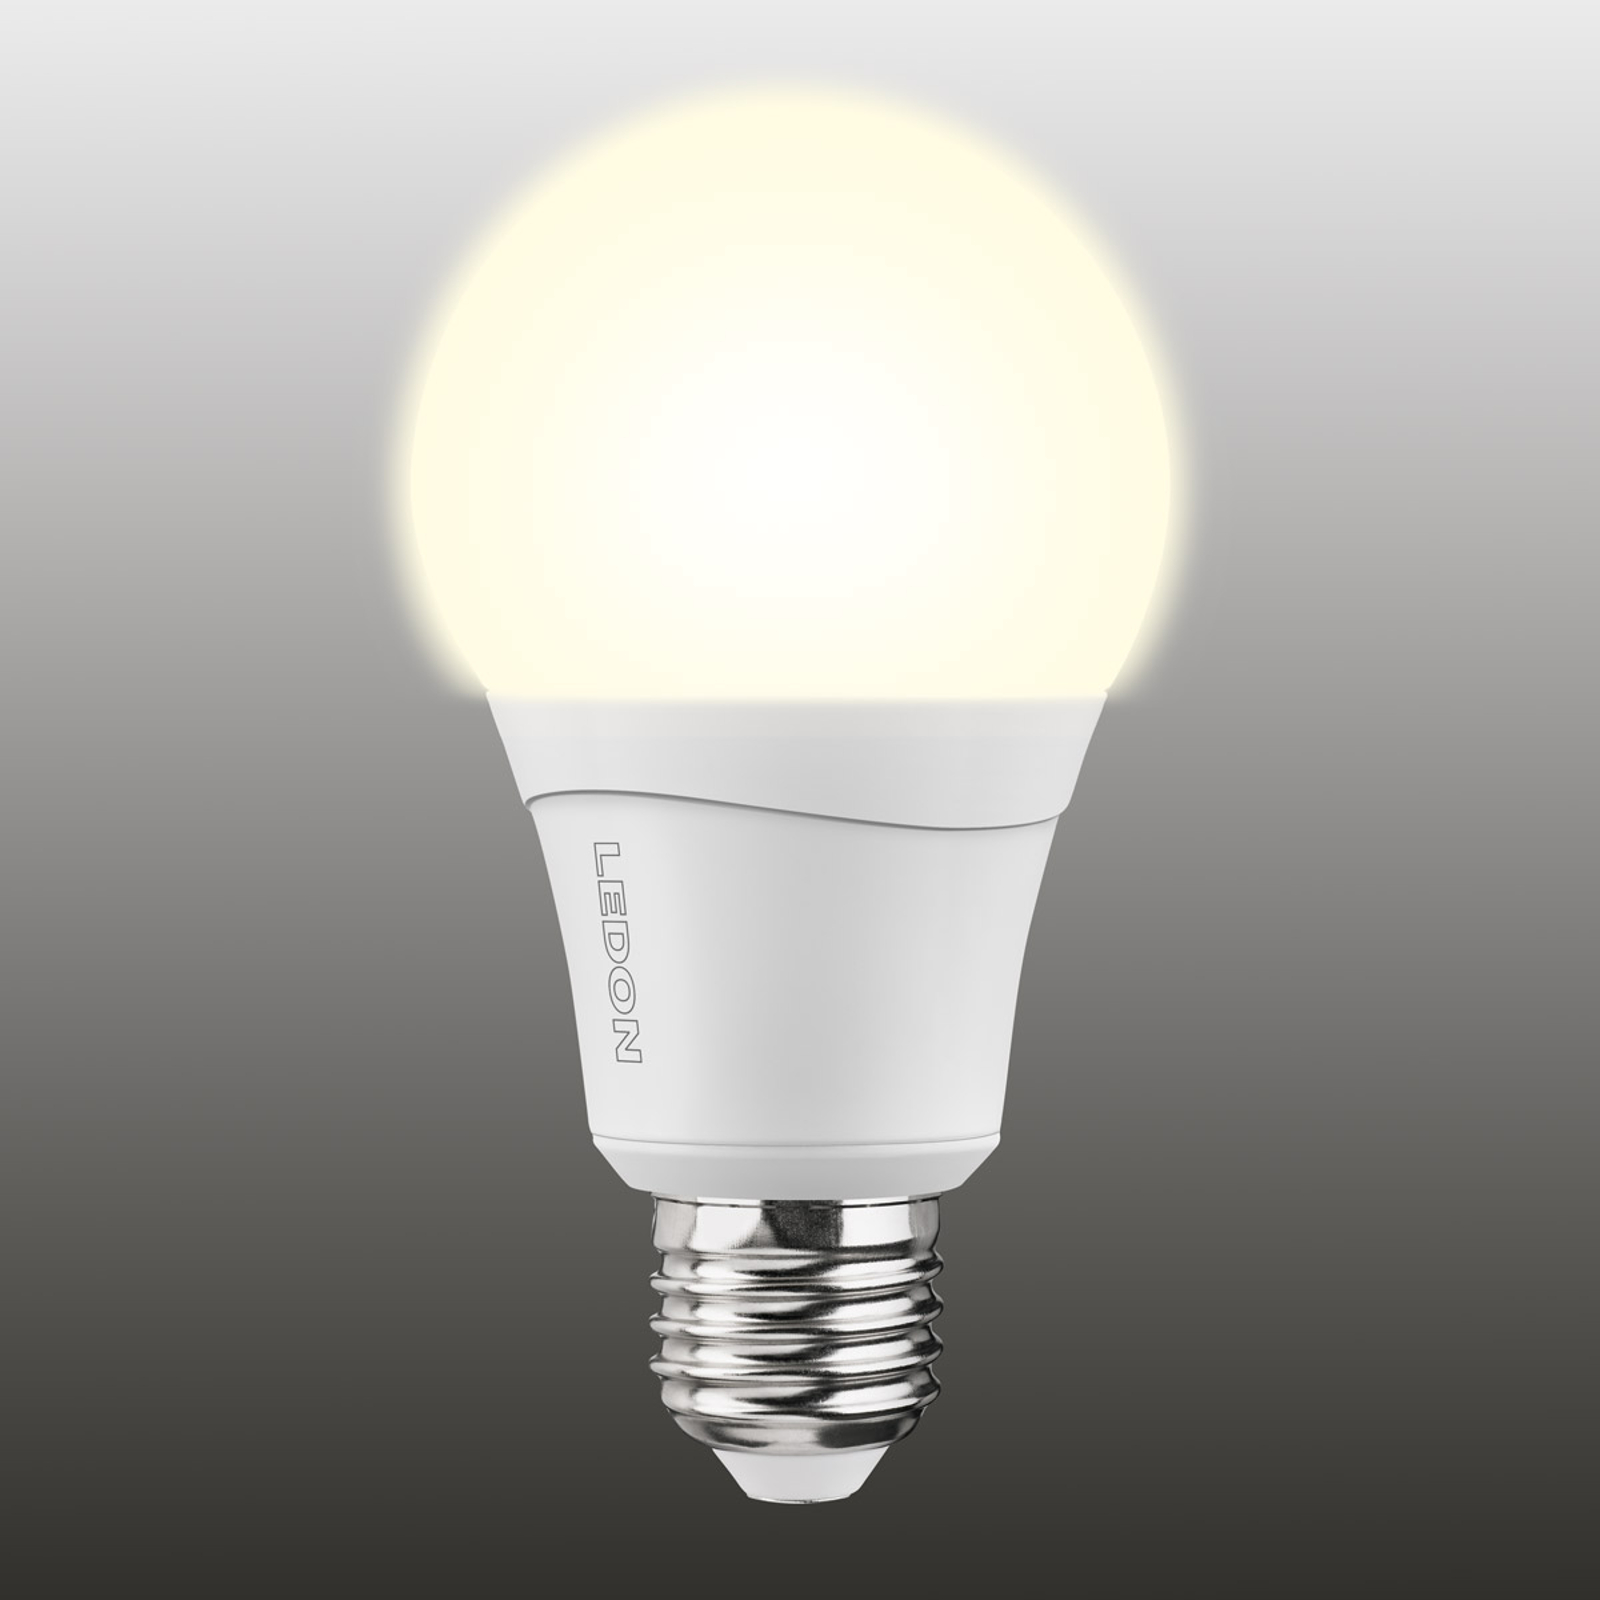 Lampadina LED 10W E27 bicolore relax (820/827)